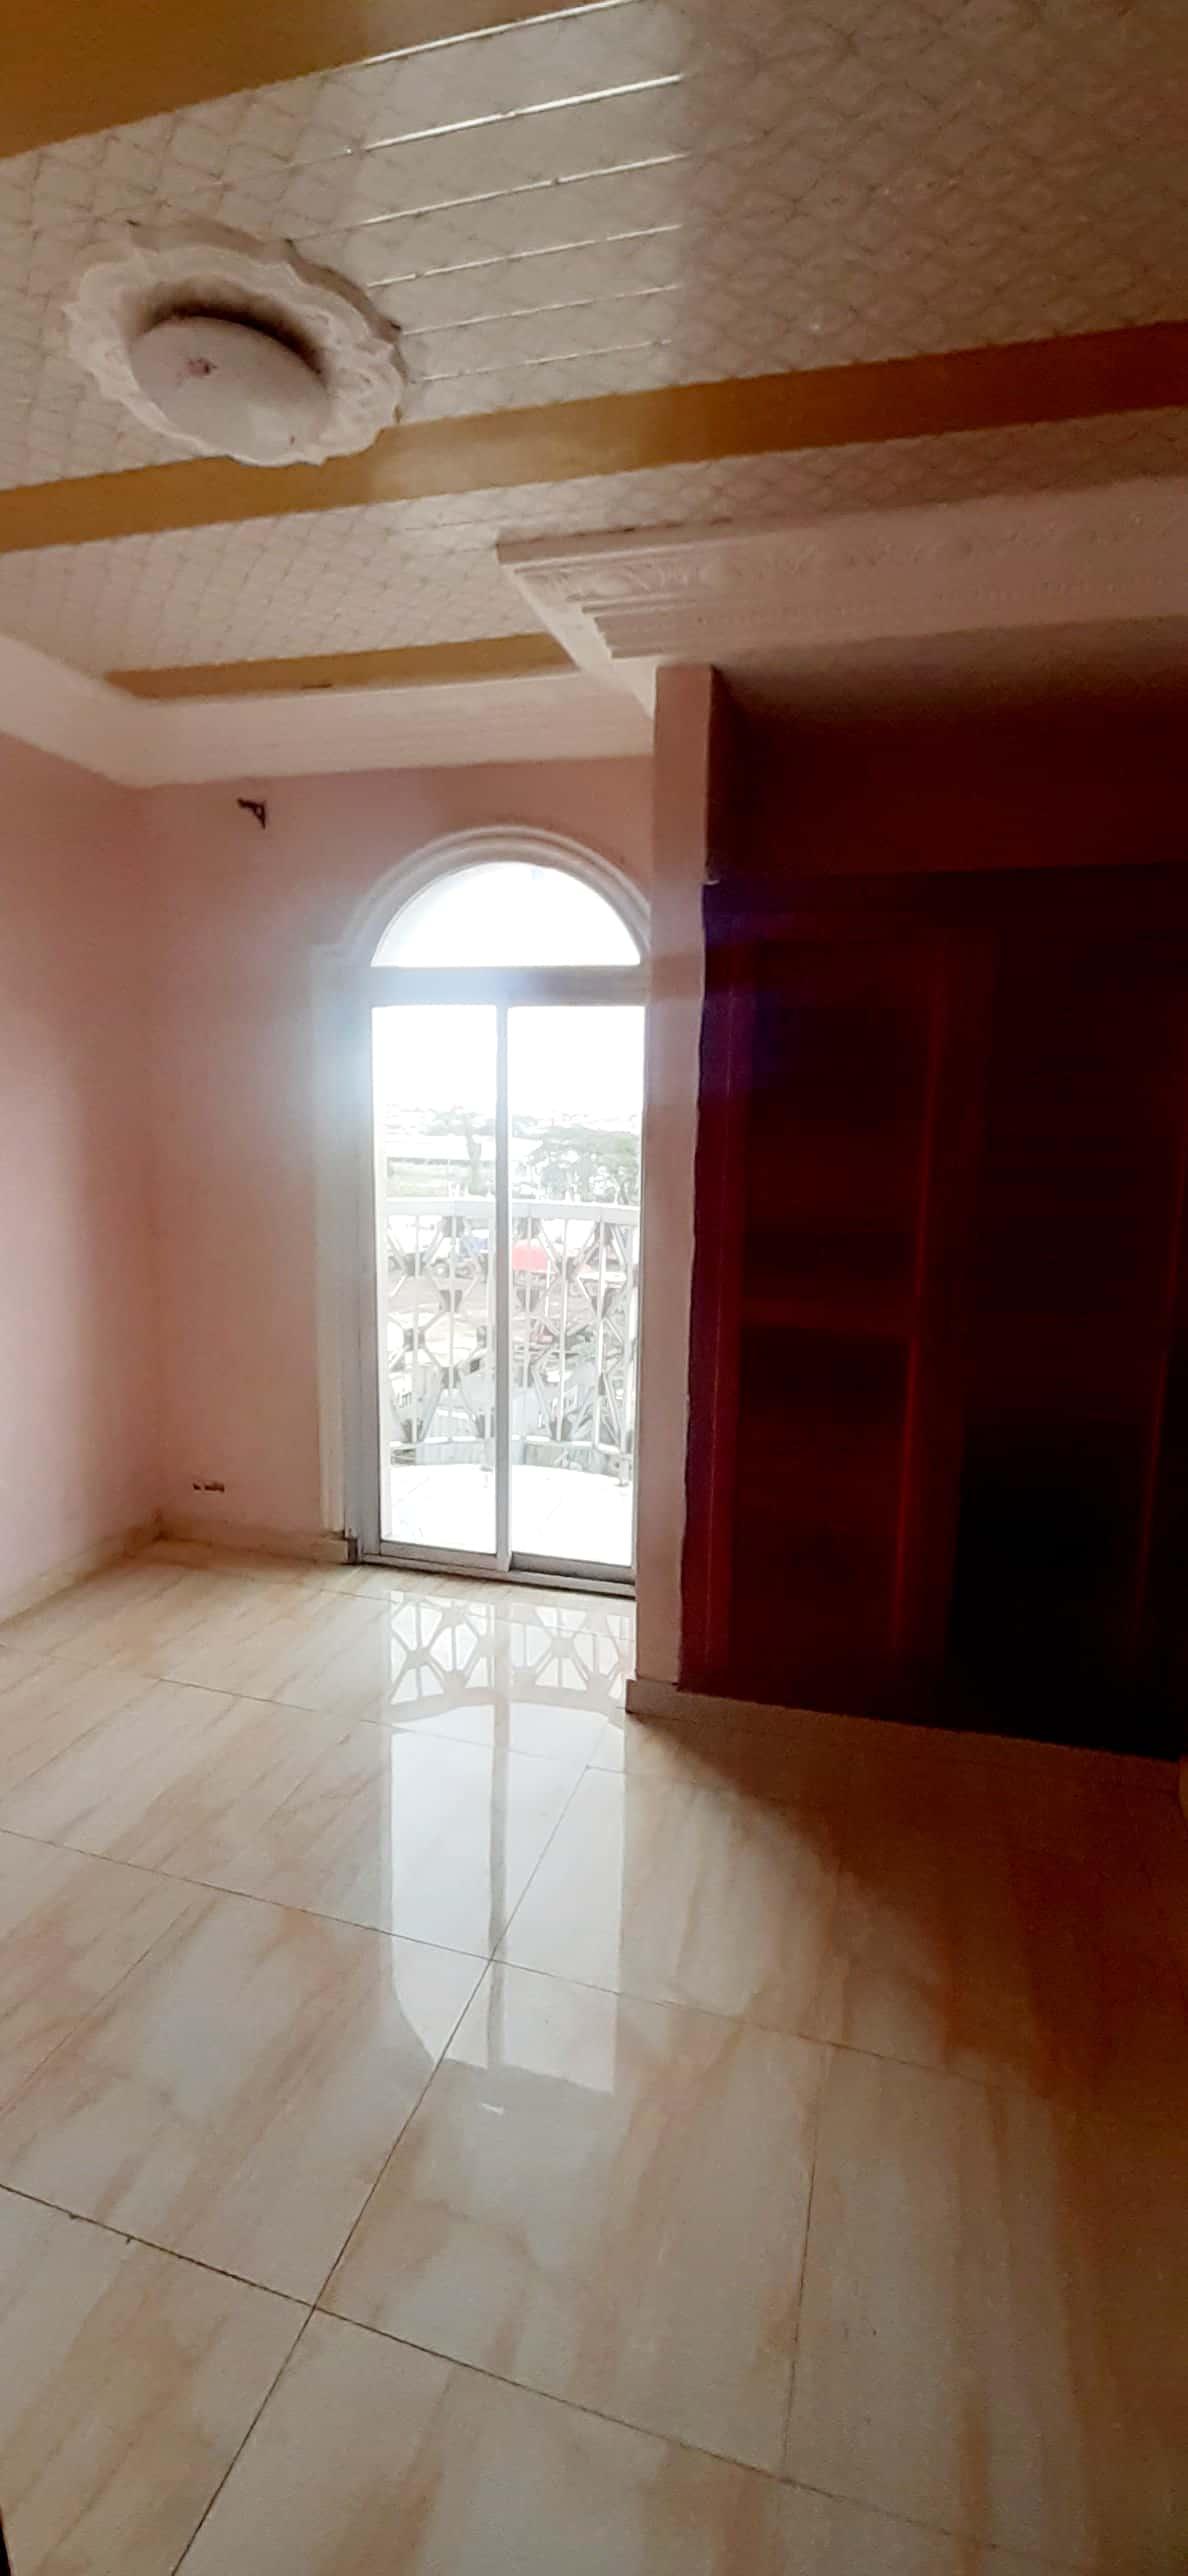 Apartment to rent - Douala, Kotto, Kotto à la Résidence Kotto - 1 living room(s), 2 bedroom(s), 1 bathroom(s) - 130 FCFA / month